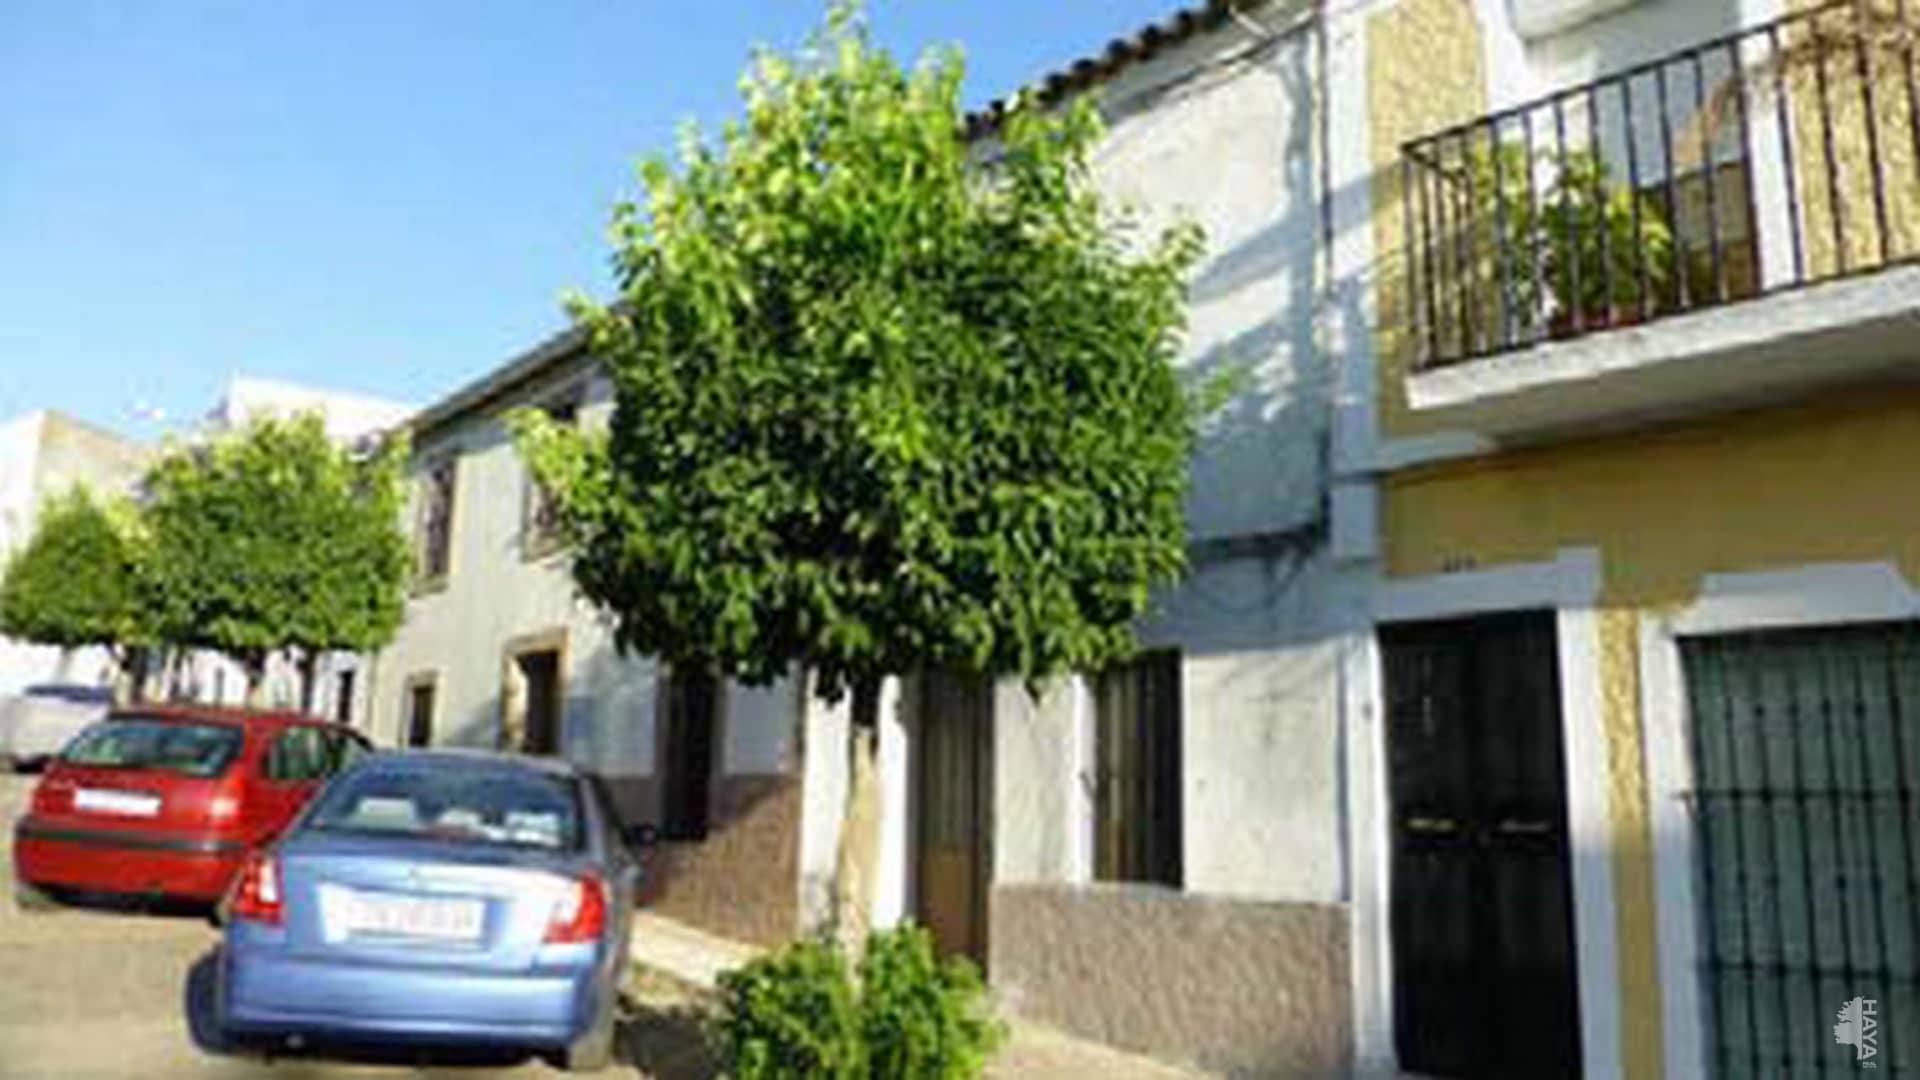 Casa en venta en Barcarrota, Barcarrota, Badajoz, Calle Virgen de Soterraño, 31.800 €, 3 habitaciones, 1 baño, 78 m2